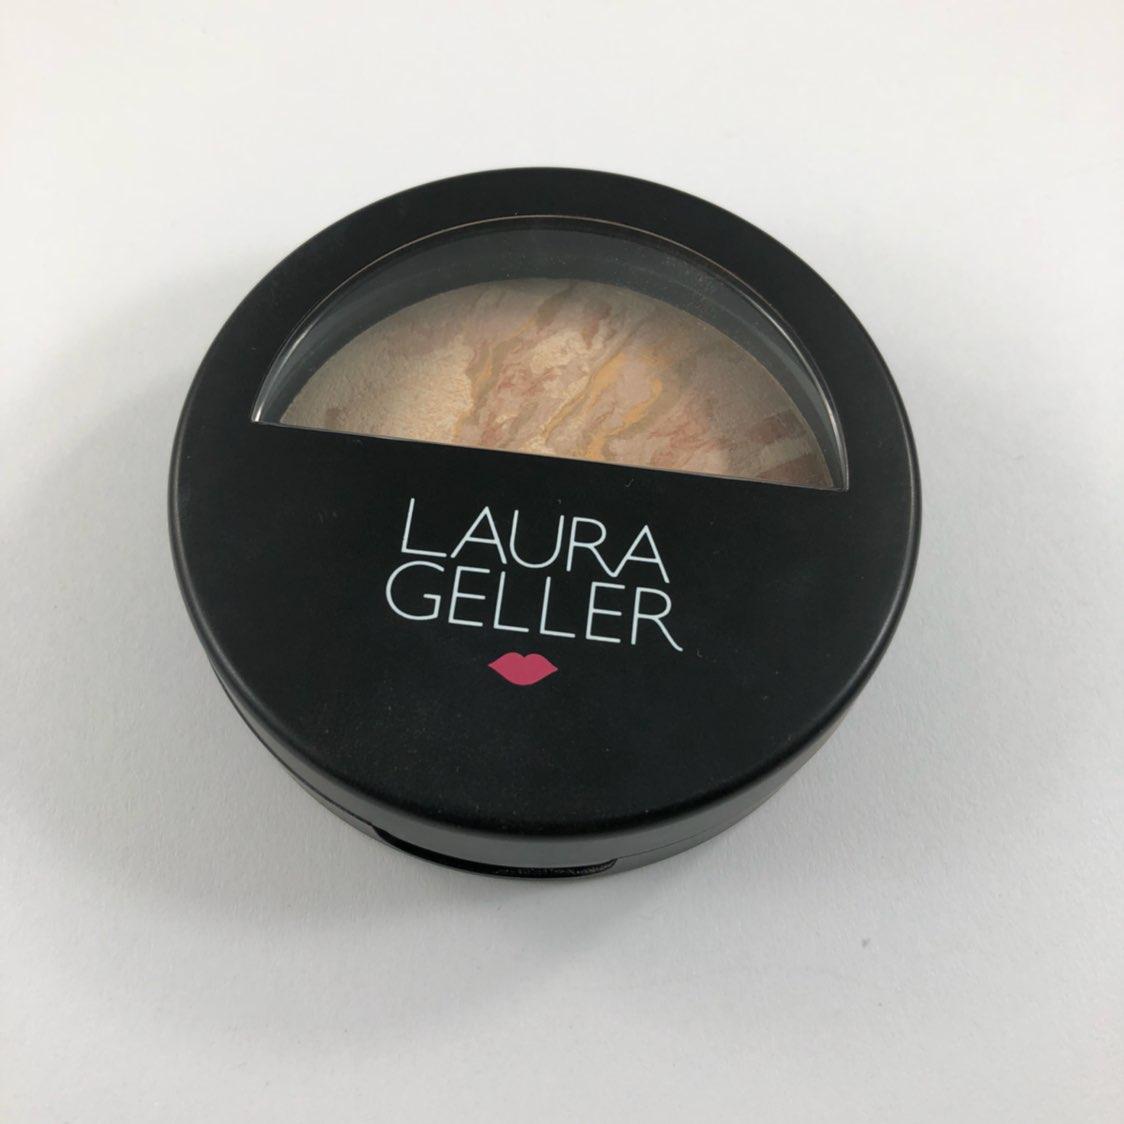 Laura Geller Balance & Brighten Fair.